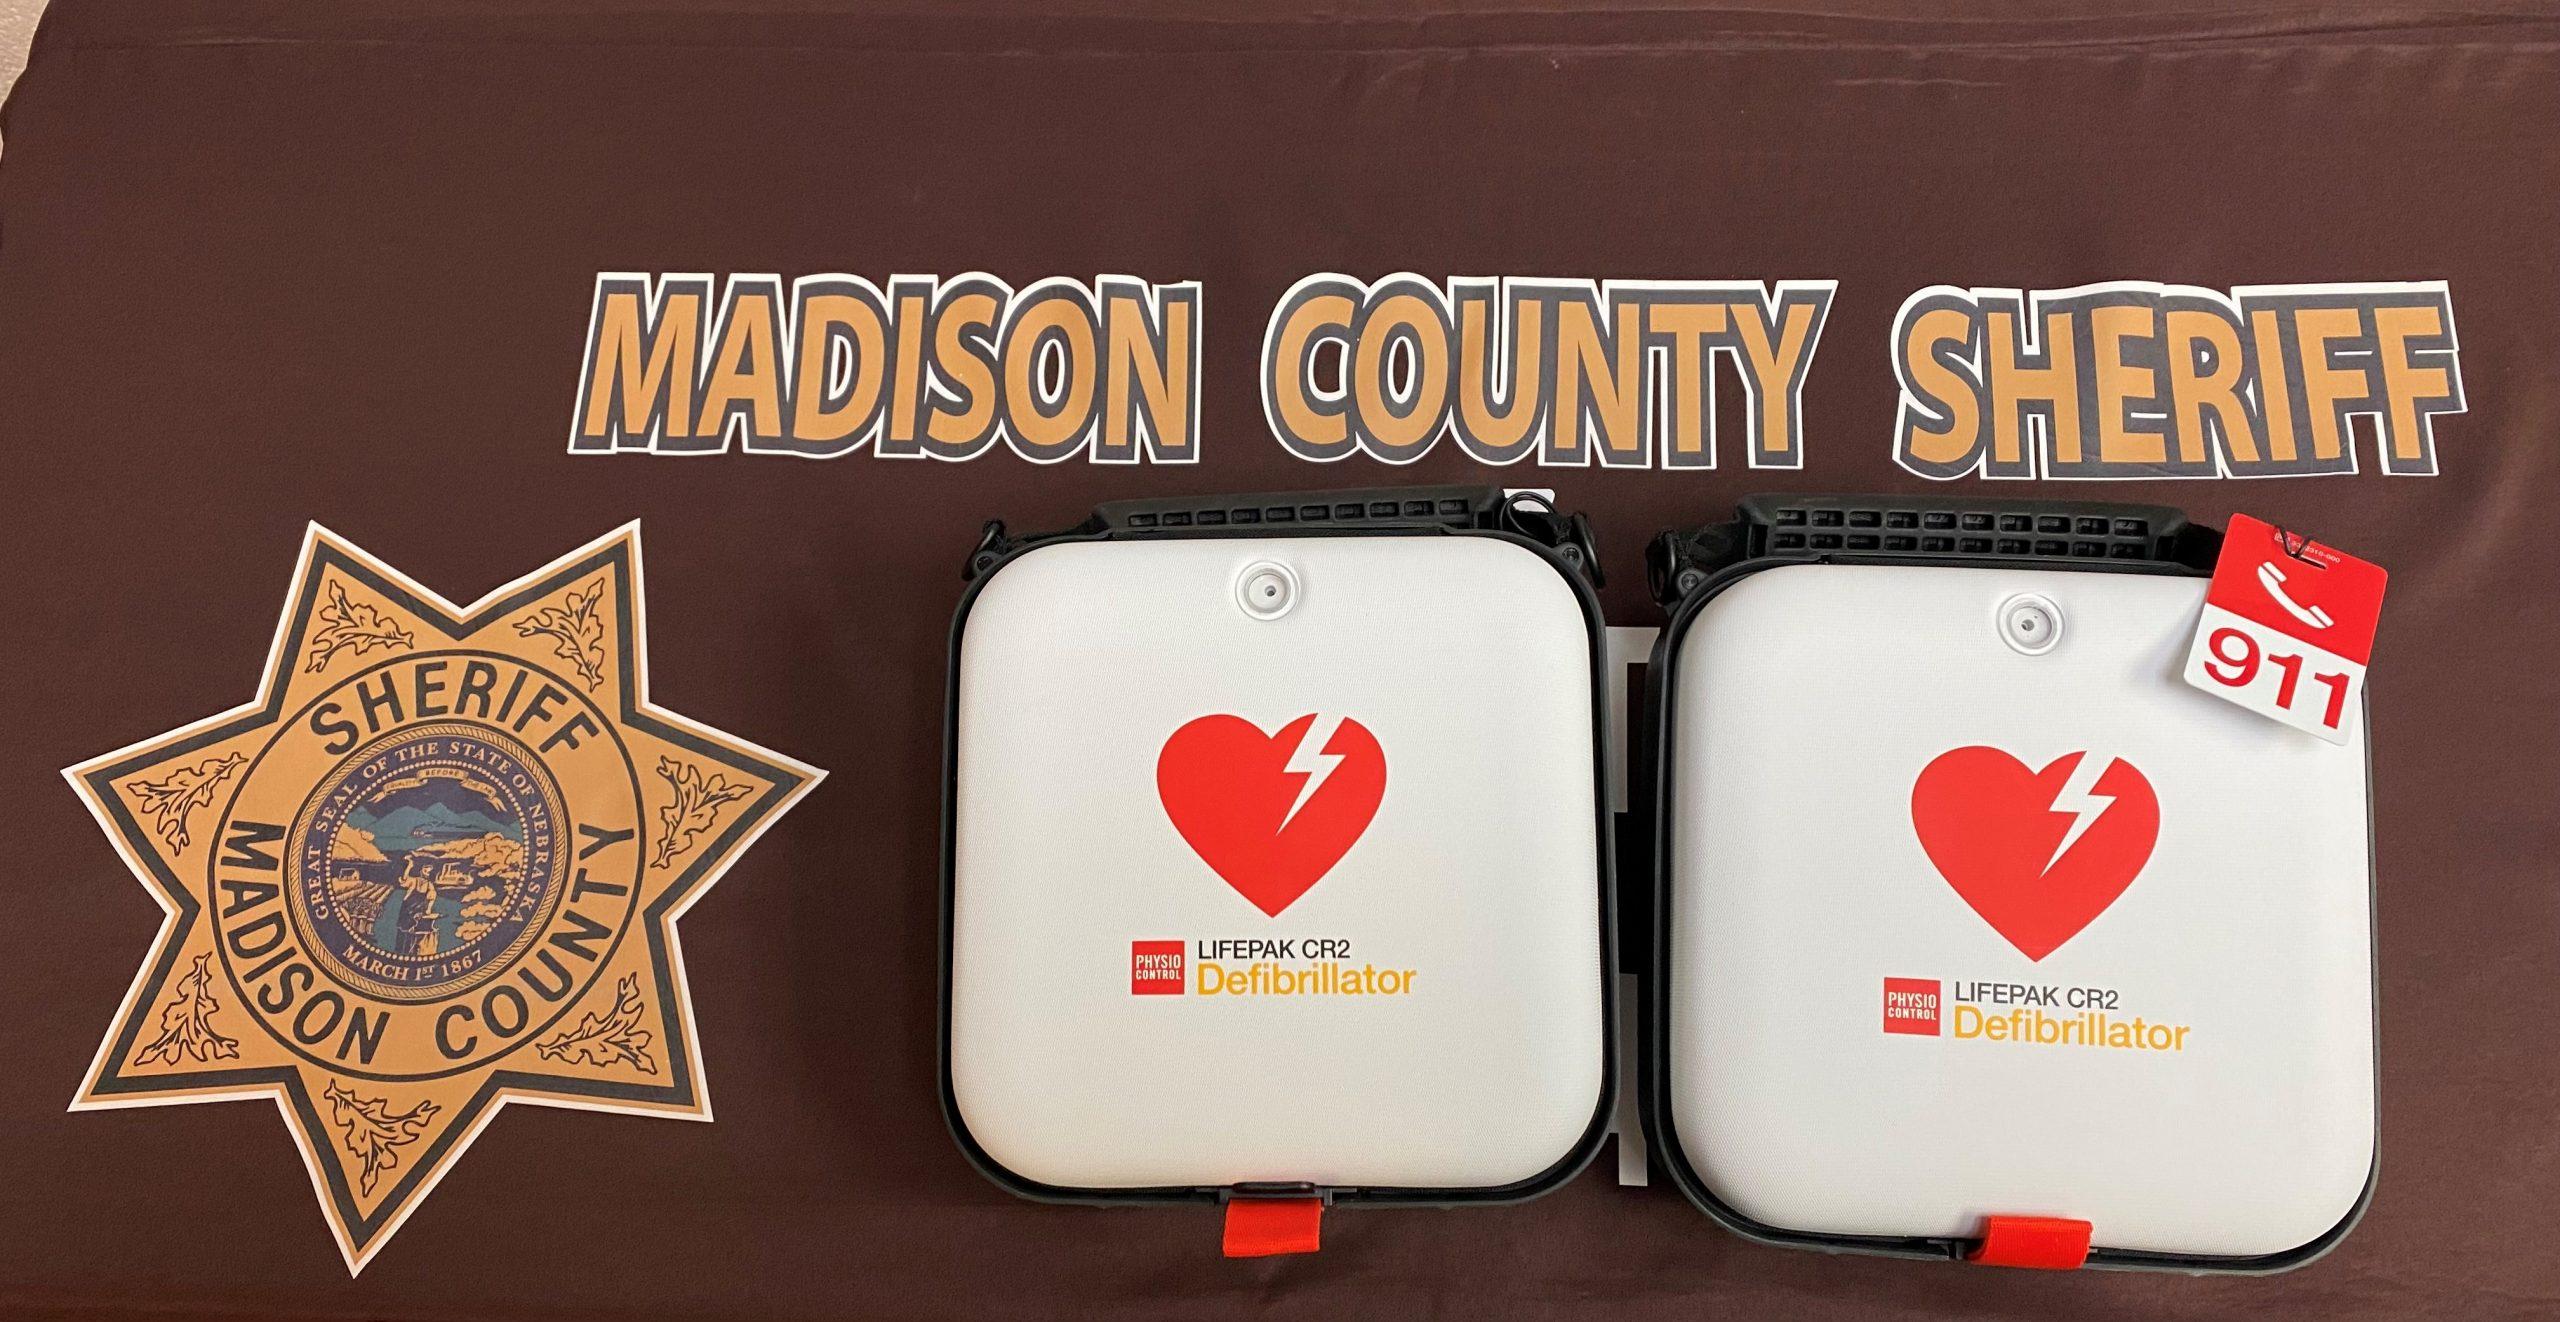 Grant money brings life-saving equipment to Madison County